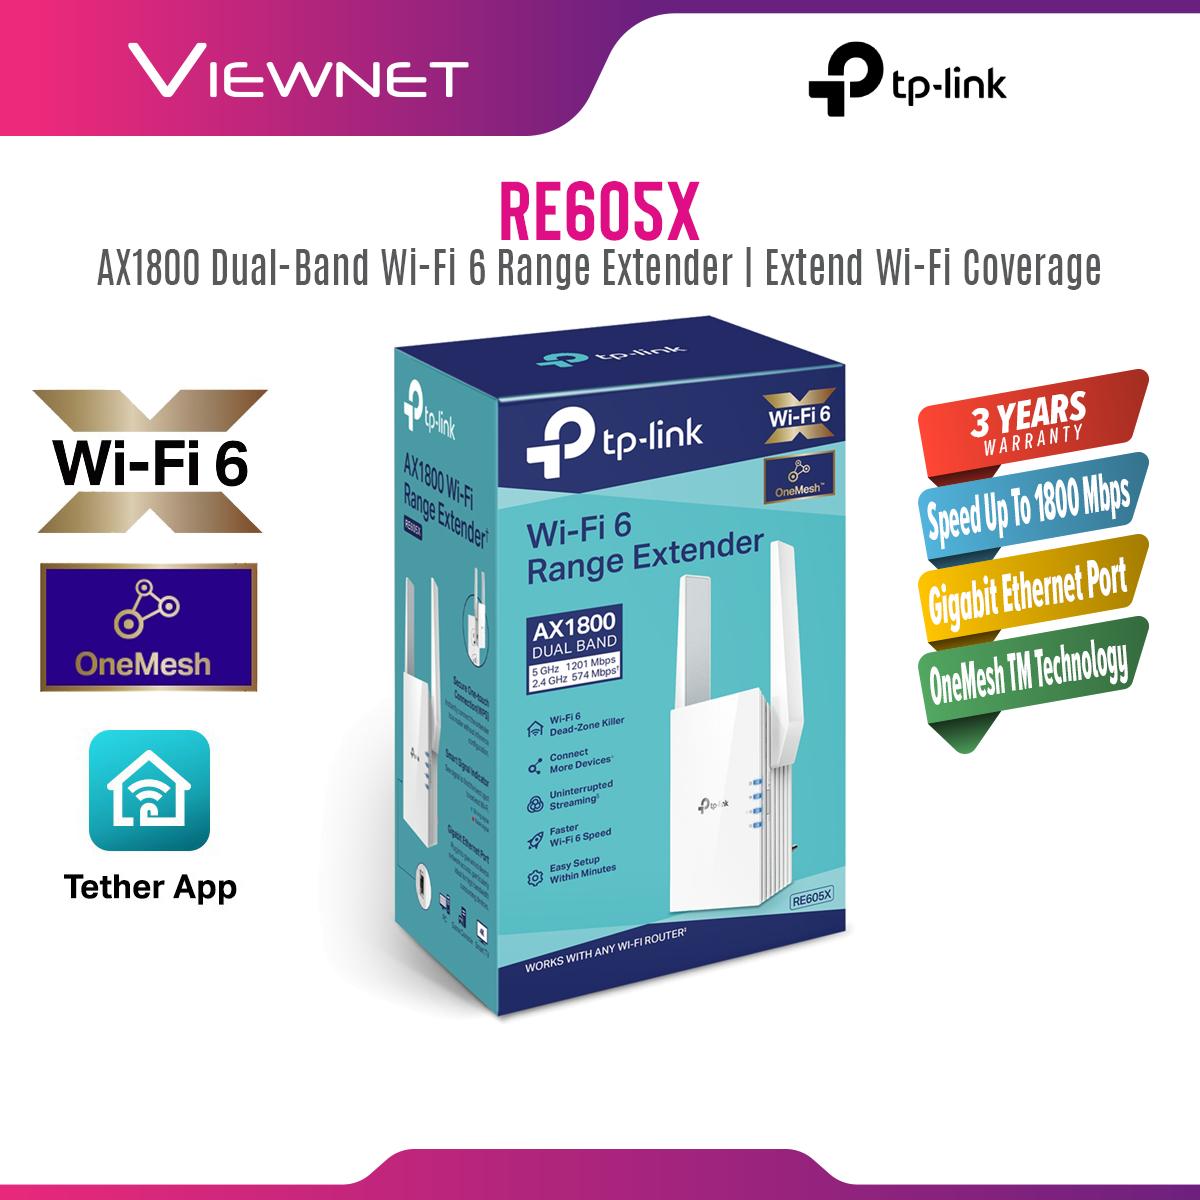 TP-Link RE605X - AX1800 Wi-Fi 6 Range Extender